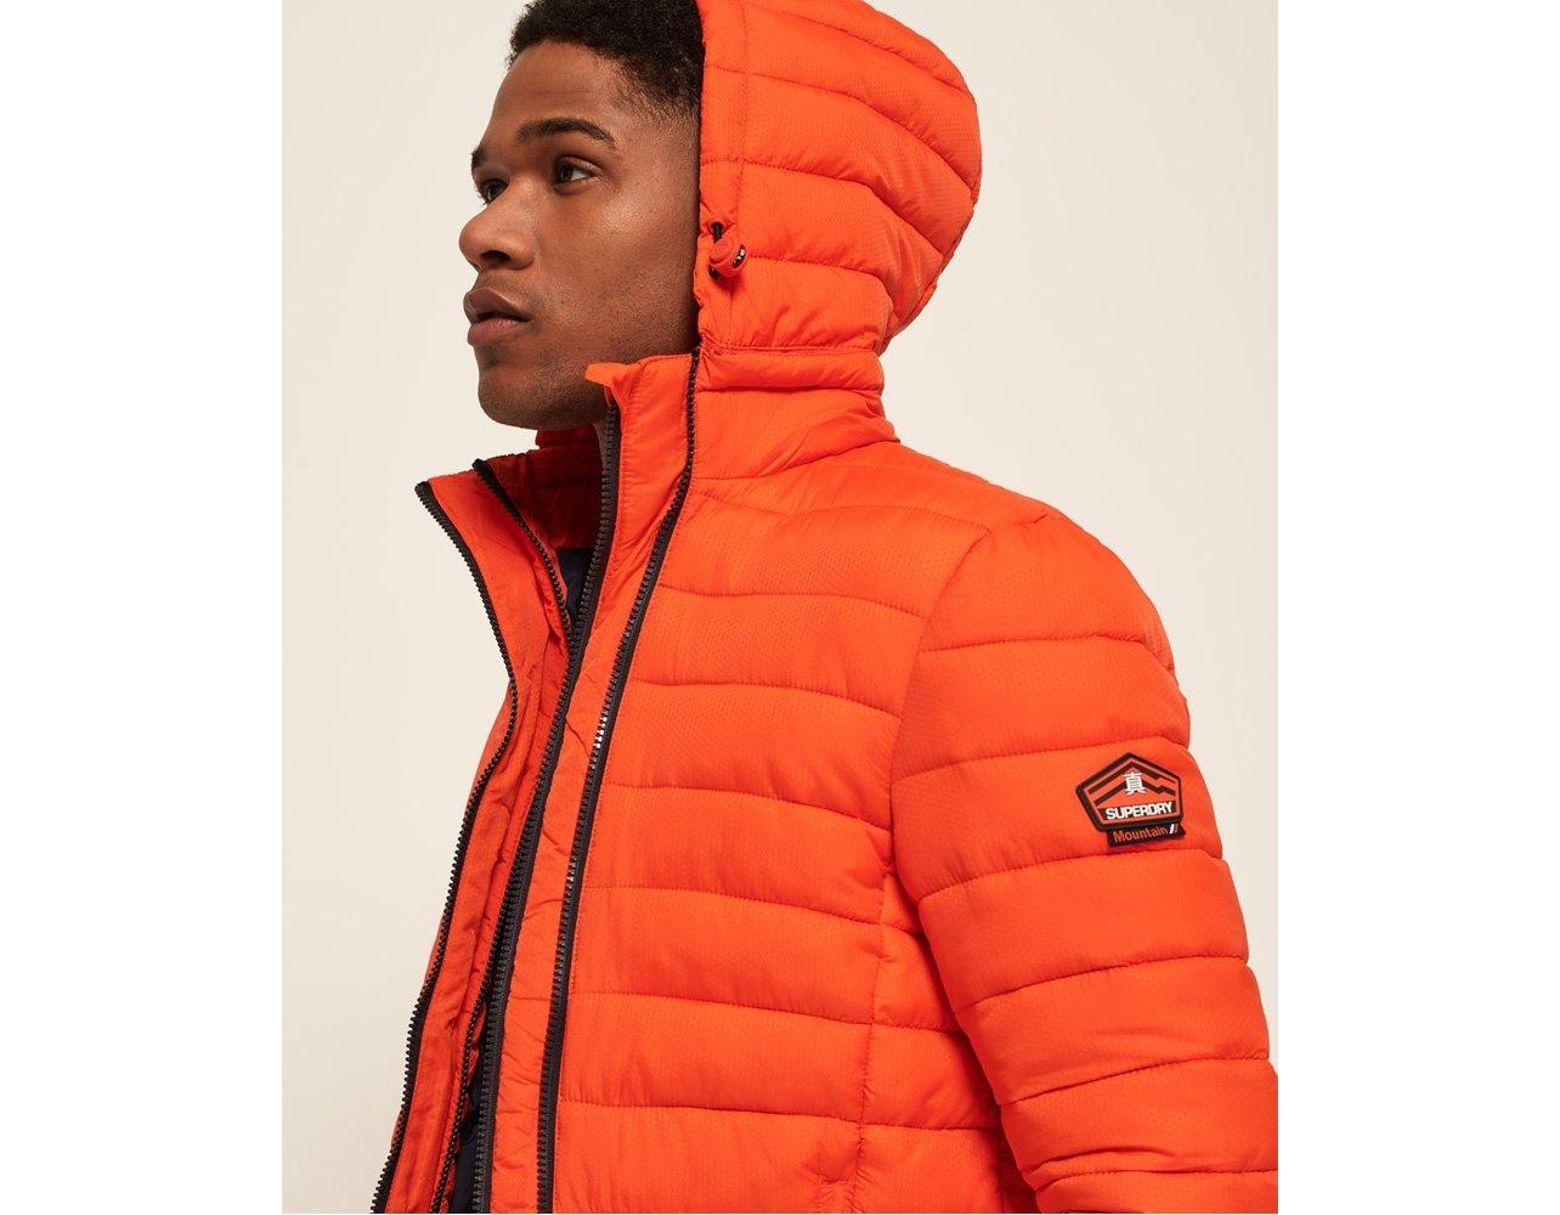 19a74c5b91d63 Superdry Fuji Double Zip Hooded Jacket in Orange for Men - Lyst